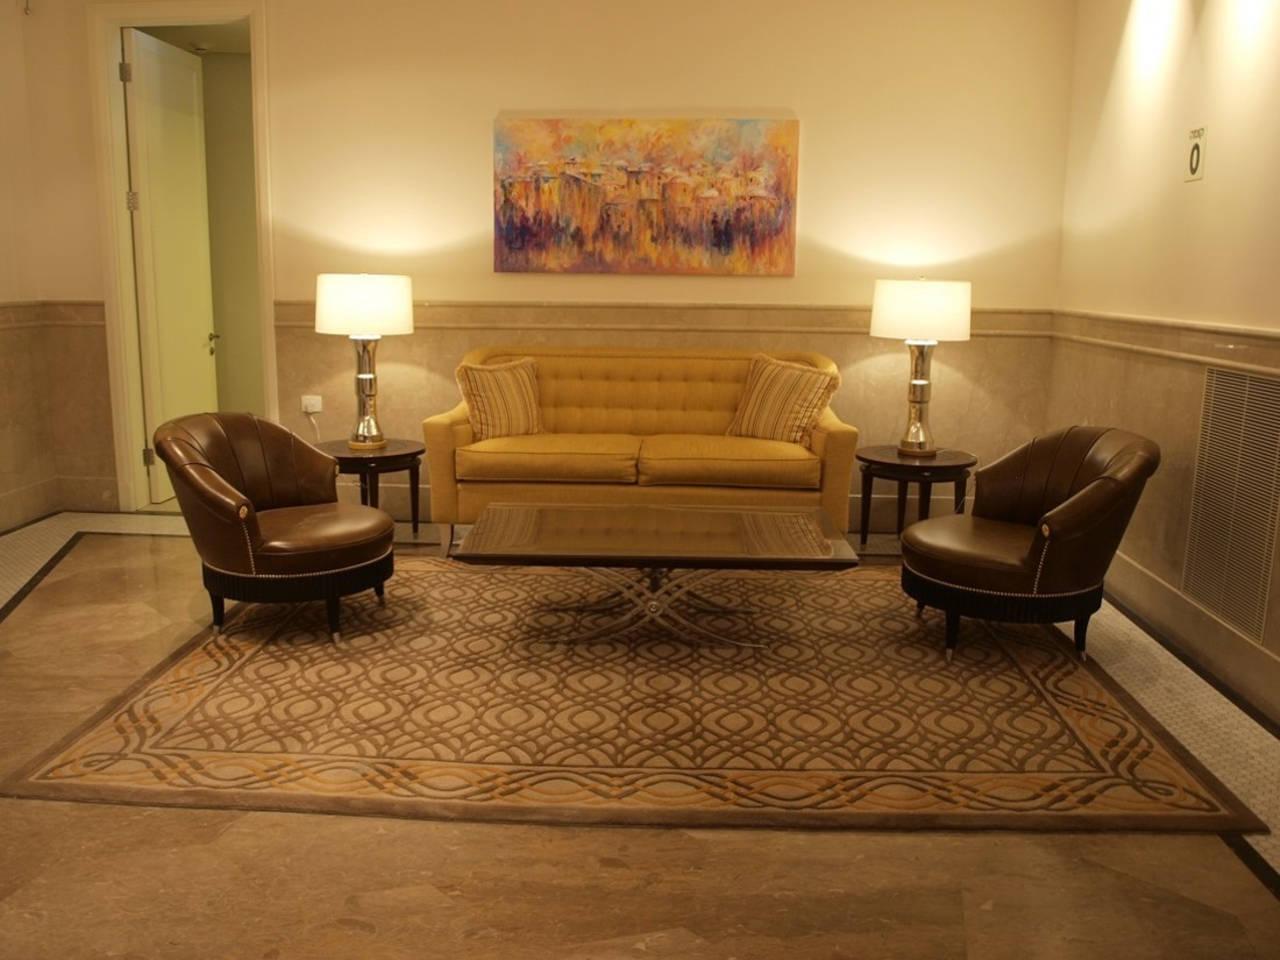 Apartment Great Location - Mamilla Mall Super Luxurious Flat photo 16708924